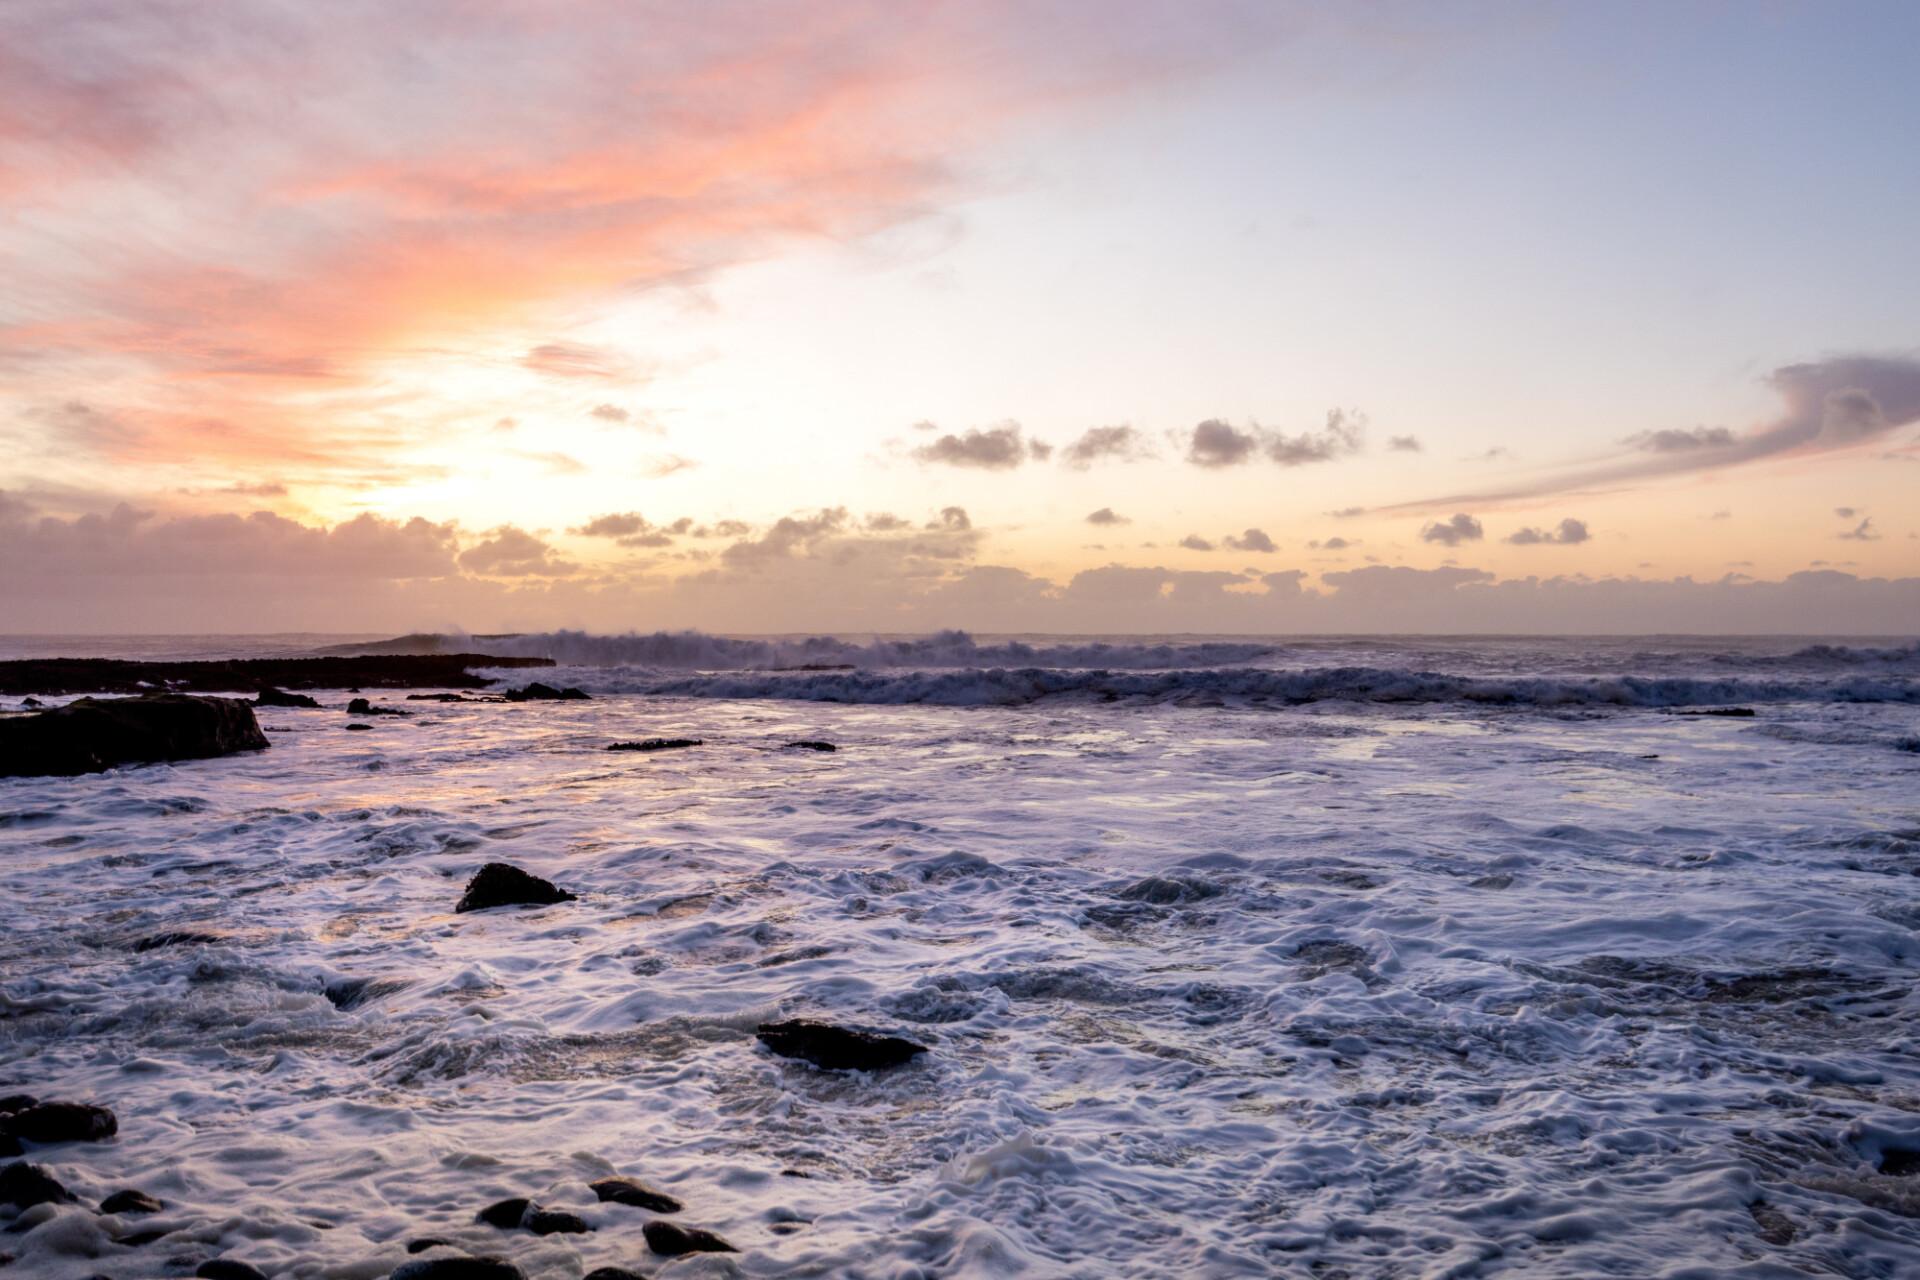 Praia do Penedo Mouro Waves Seascape in Portugal